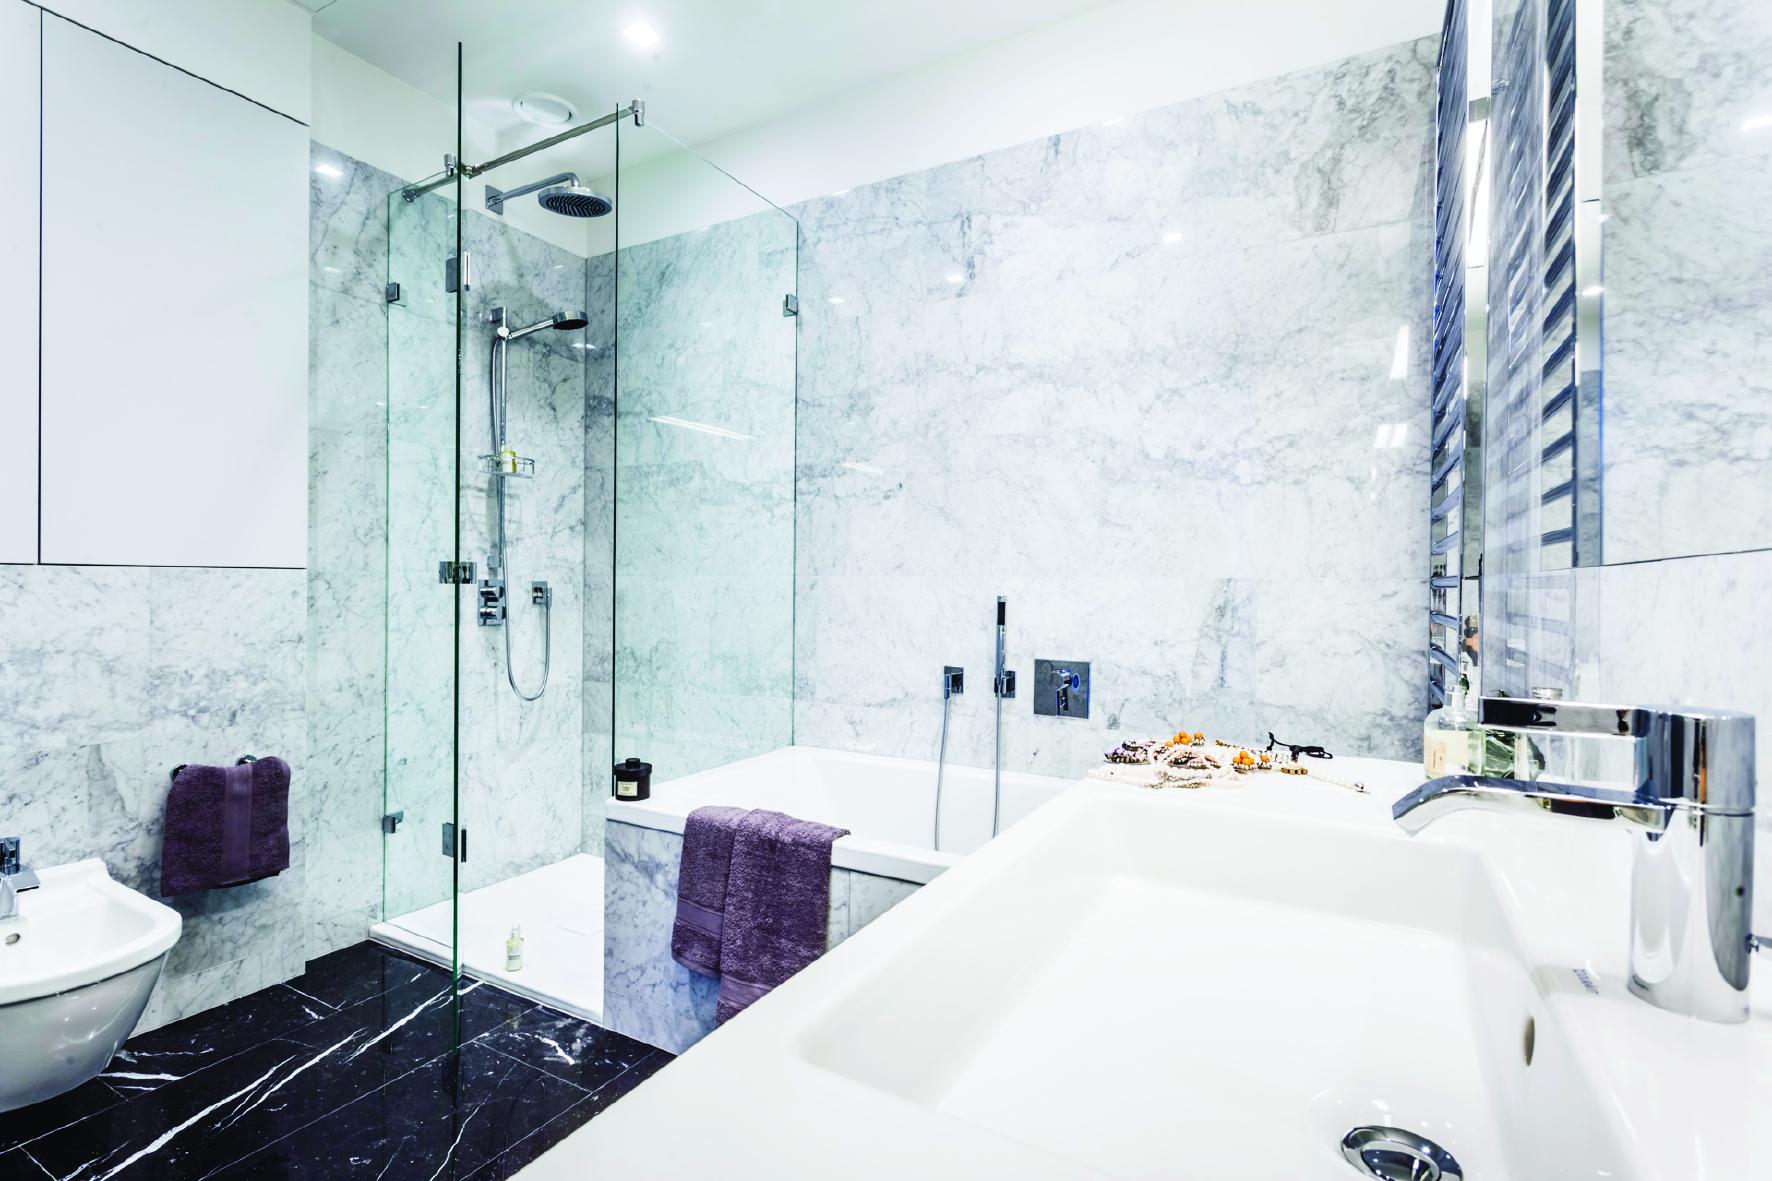 Vasca Da Bagno Kaldewei : Varsavia cosmopolitan tower le vasche da bagno e i piatti doccia